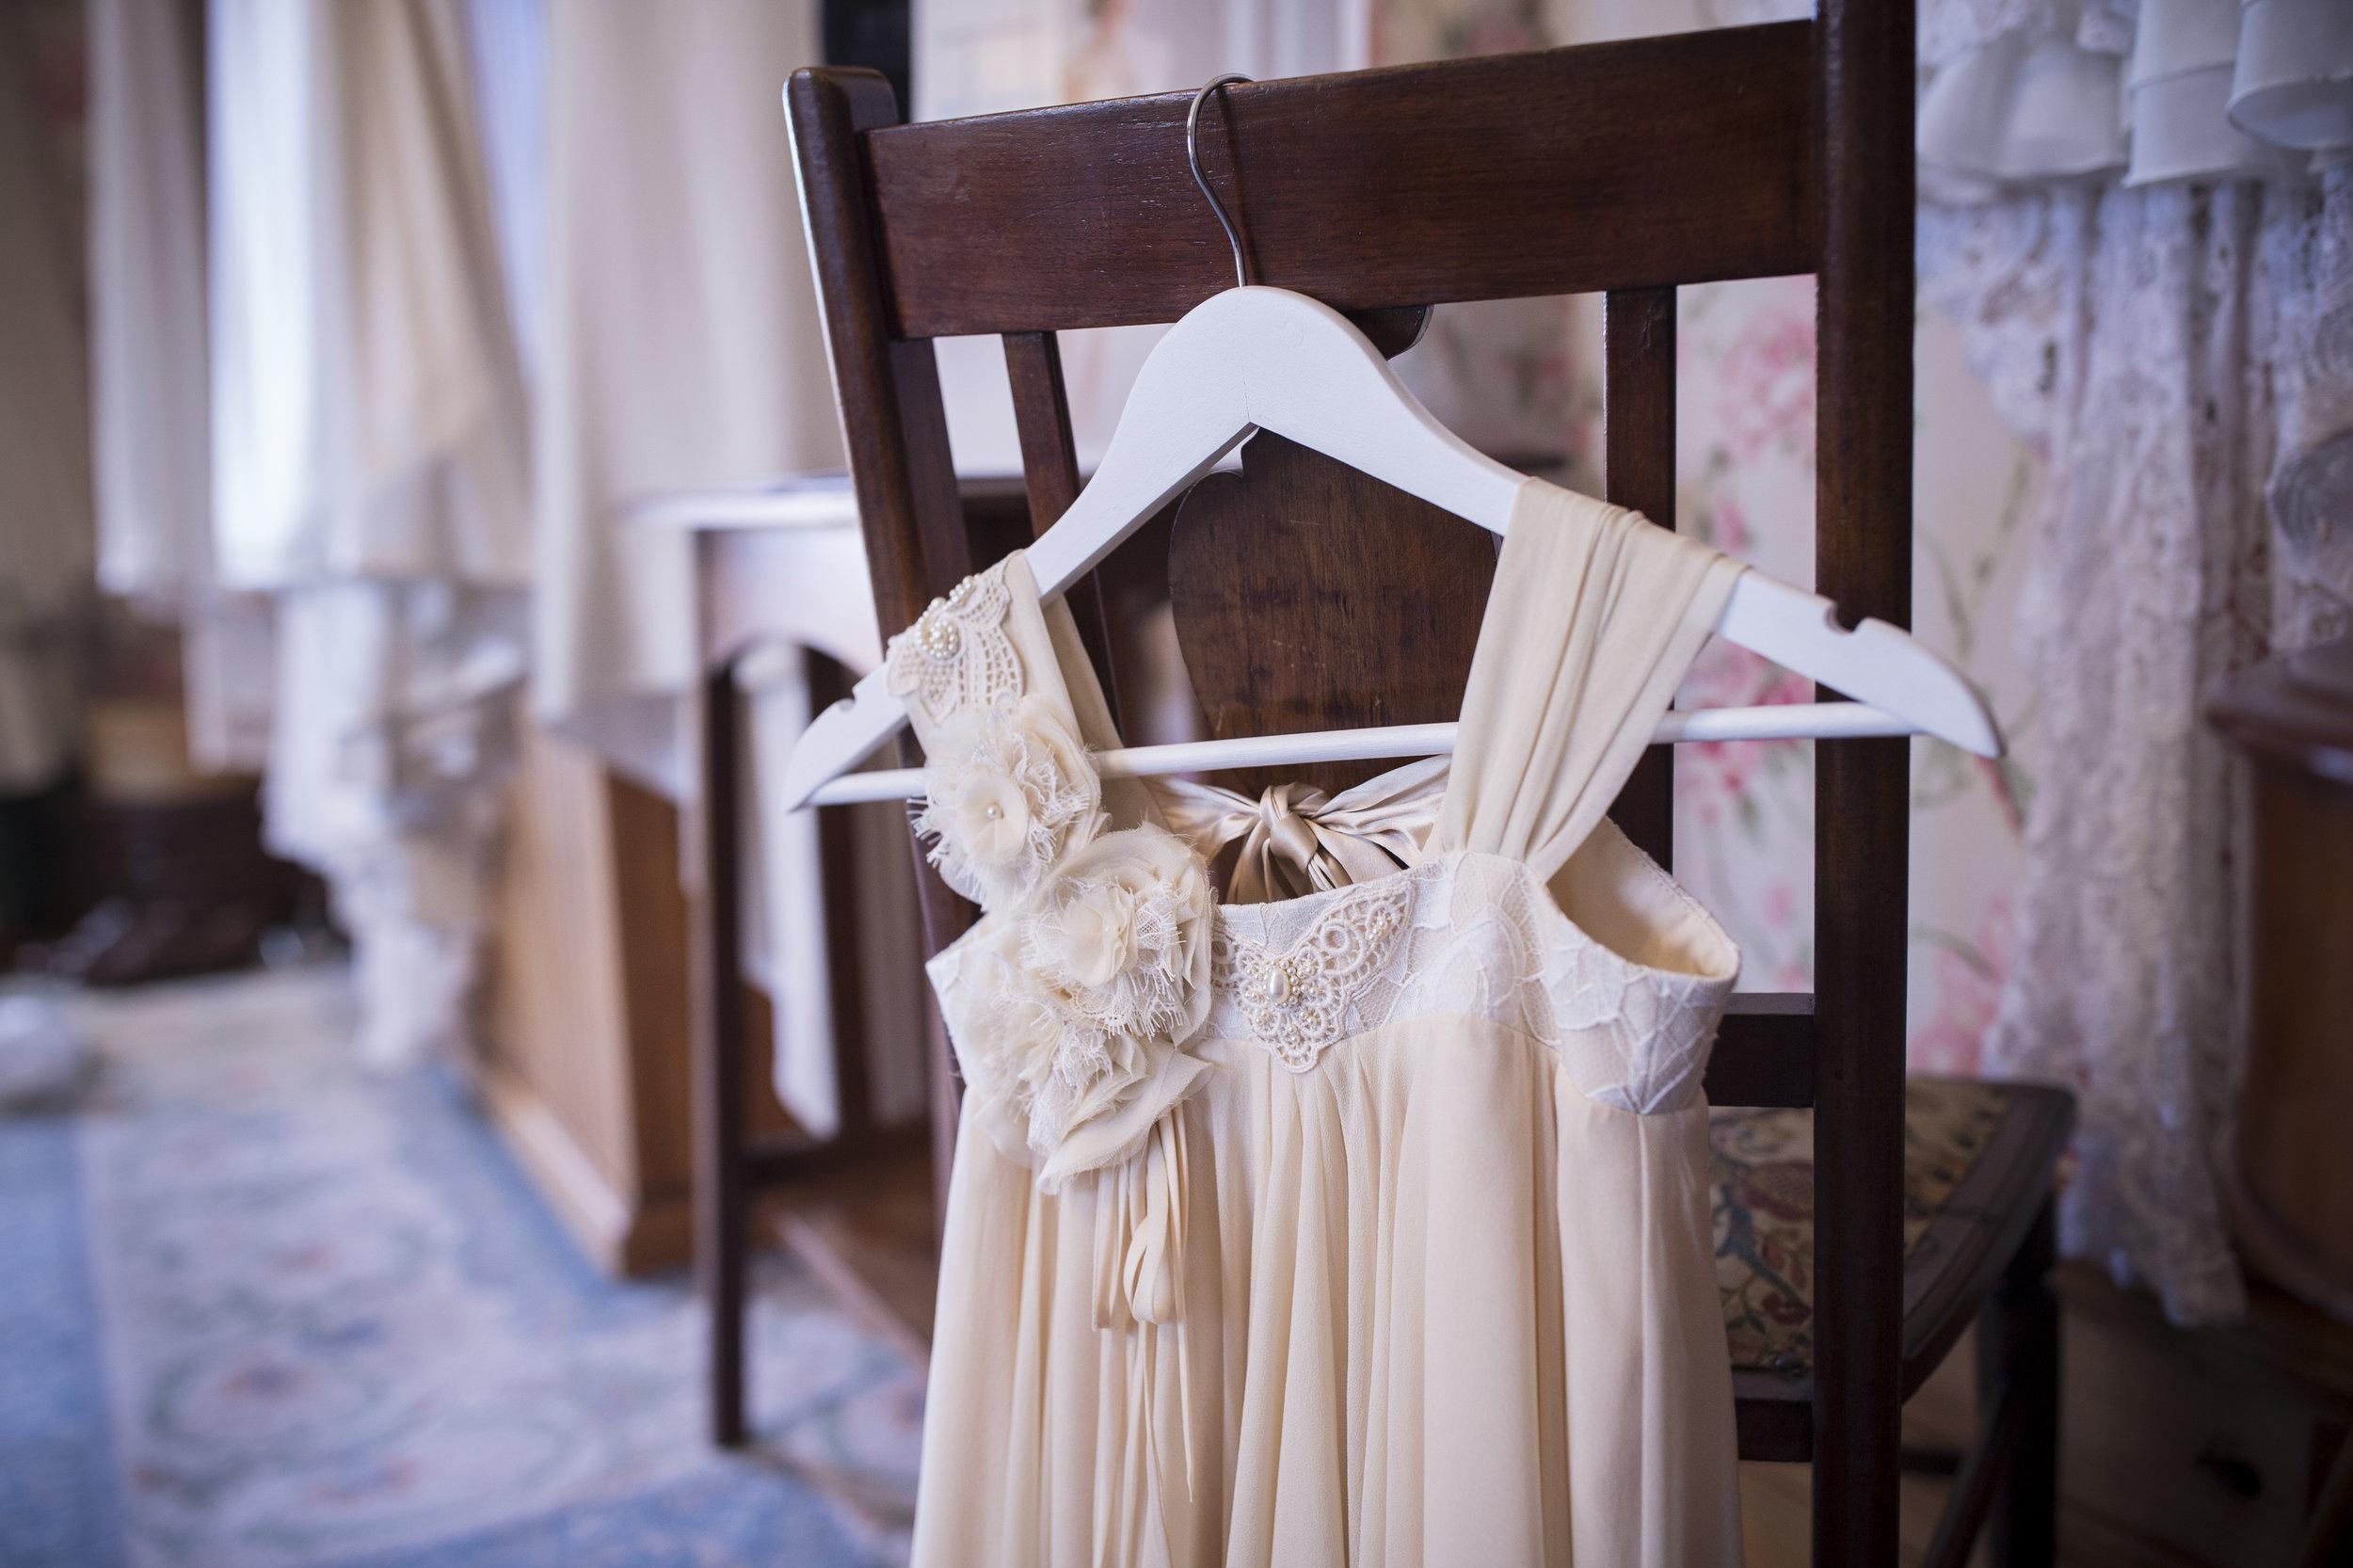 Flowergirl dress - Riccarton House styled shoot - Johannes van Kaan Photography